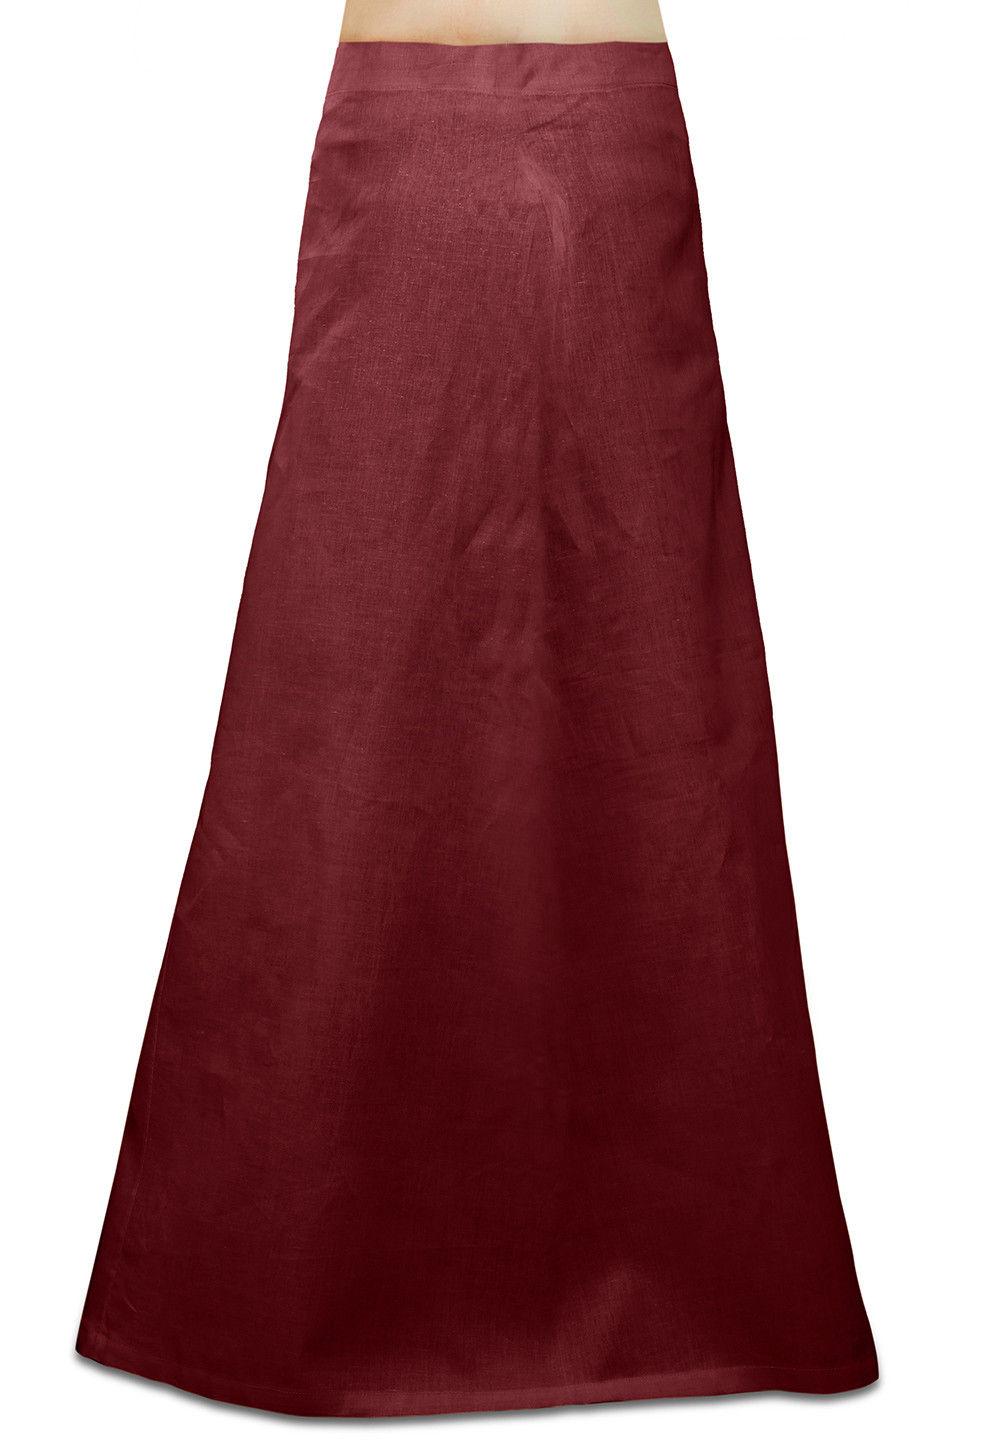 Cotton Petticoat in Maroon